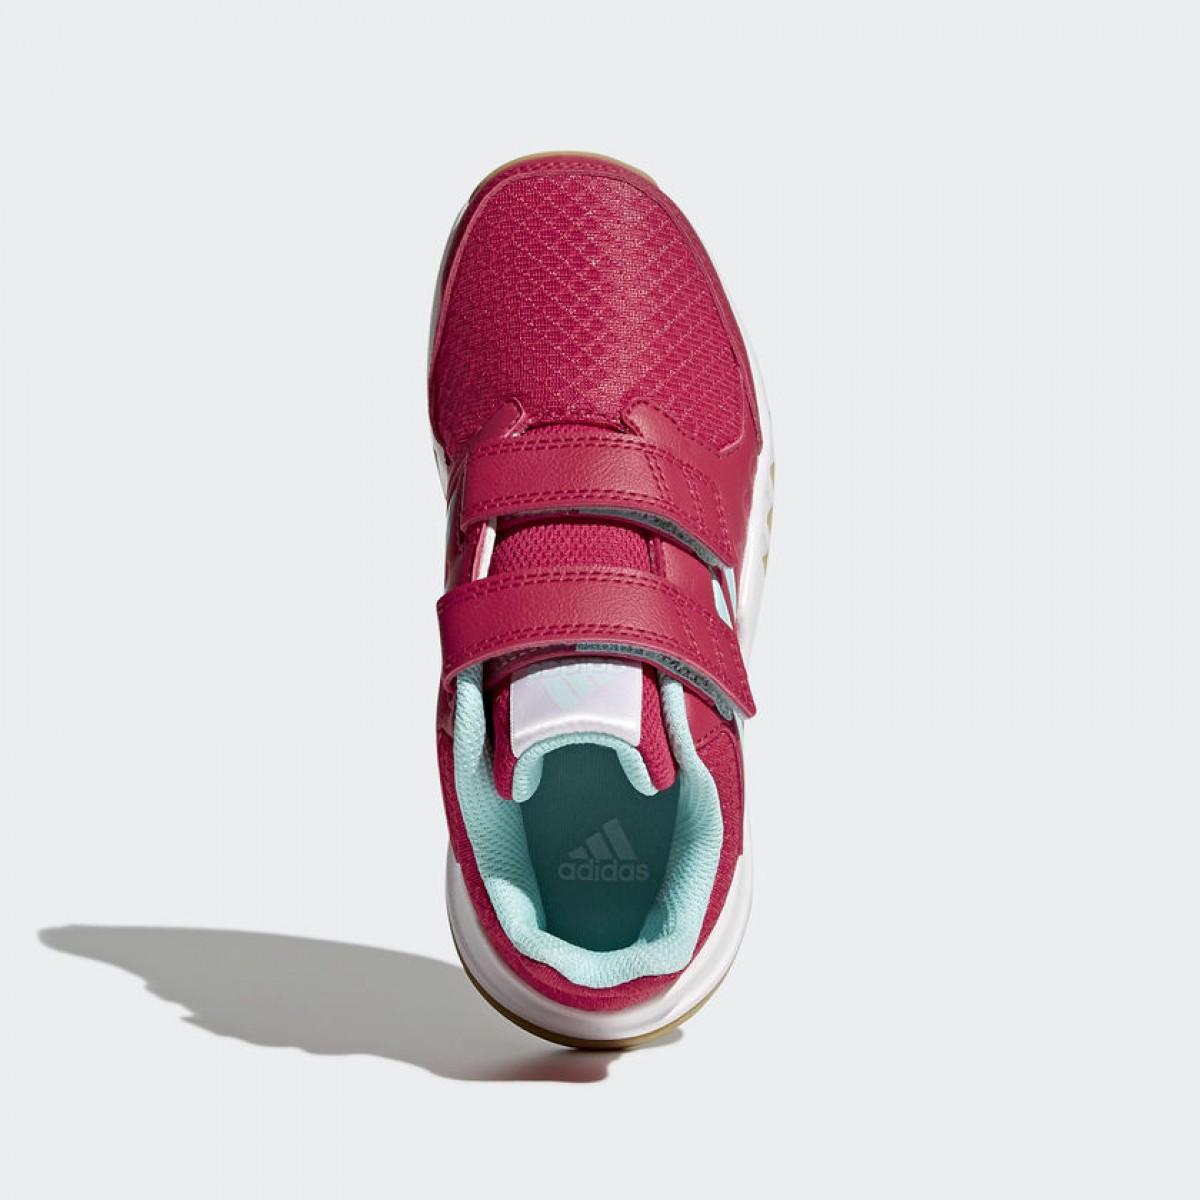 Adidas Fortagym Cf K (Training)